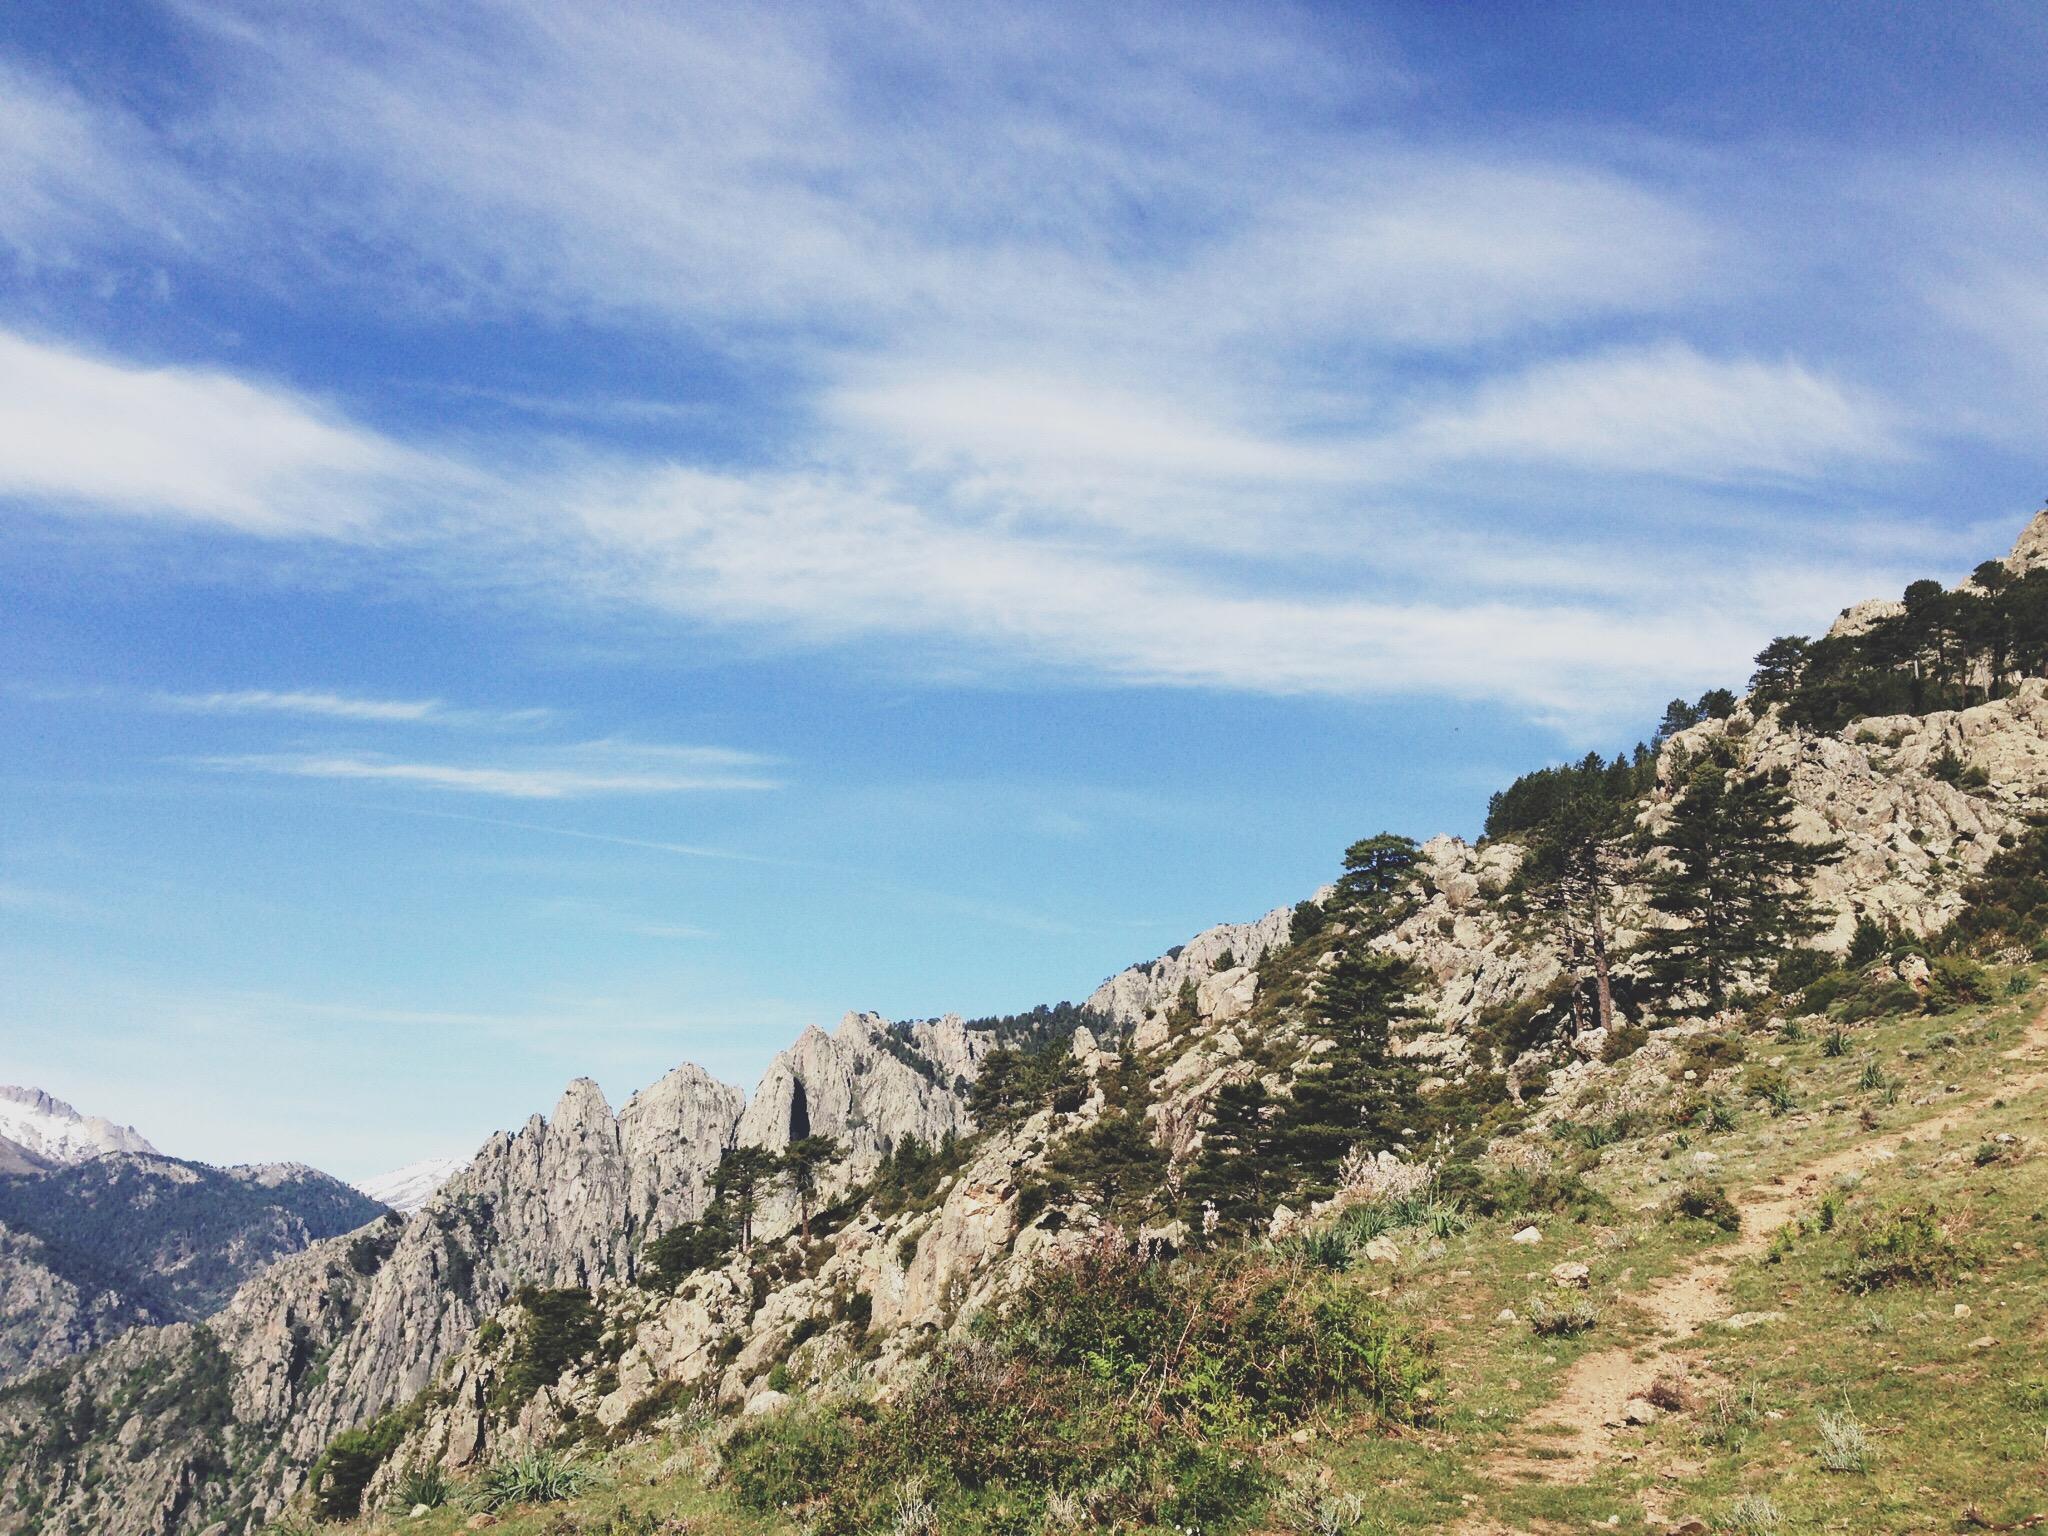 panorama-corse-blog-corsica.JPG